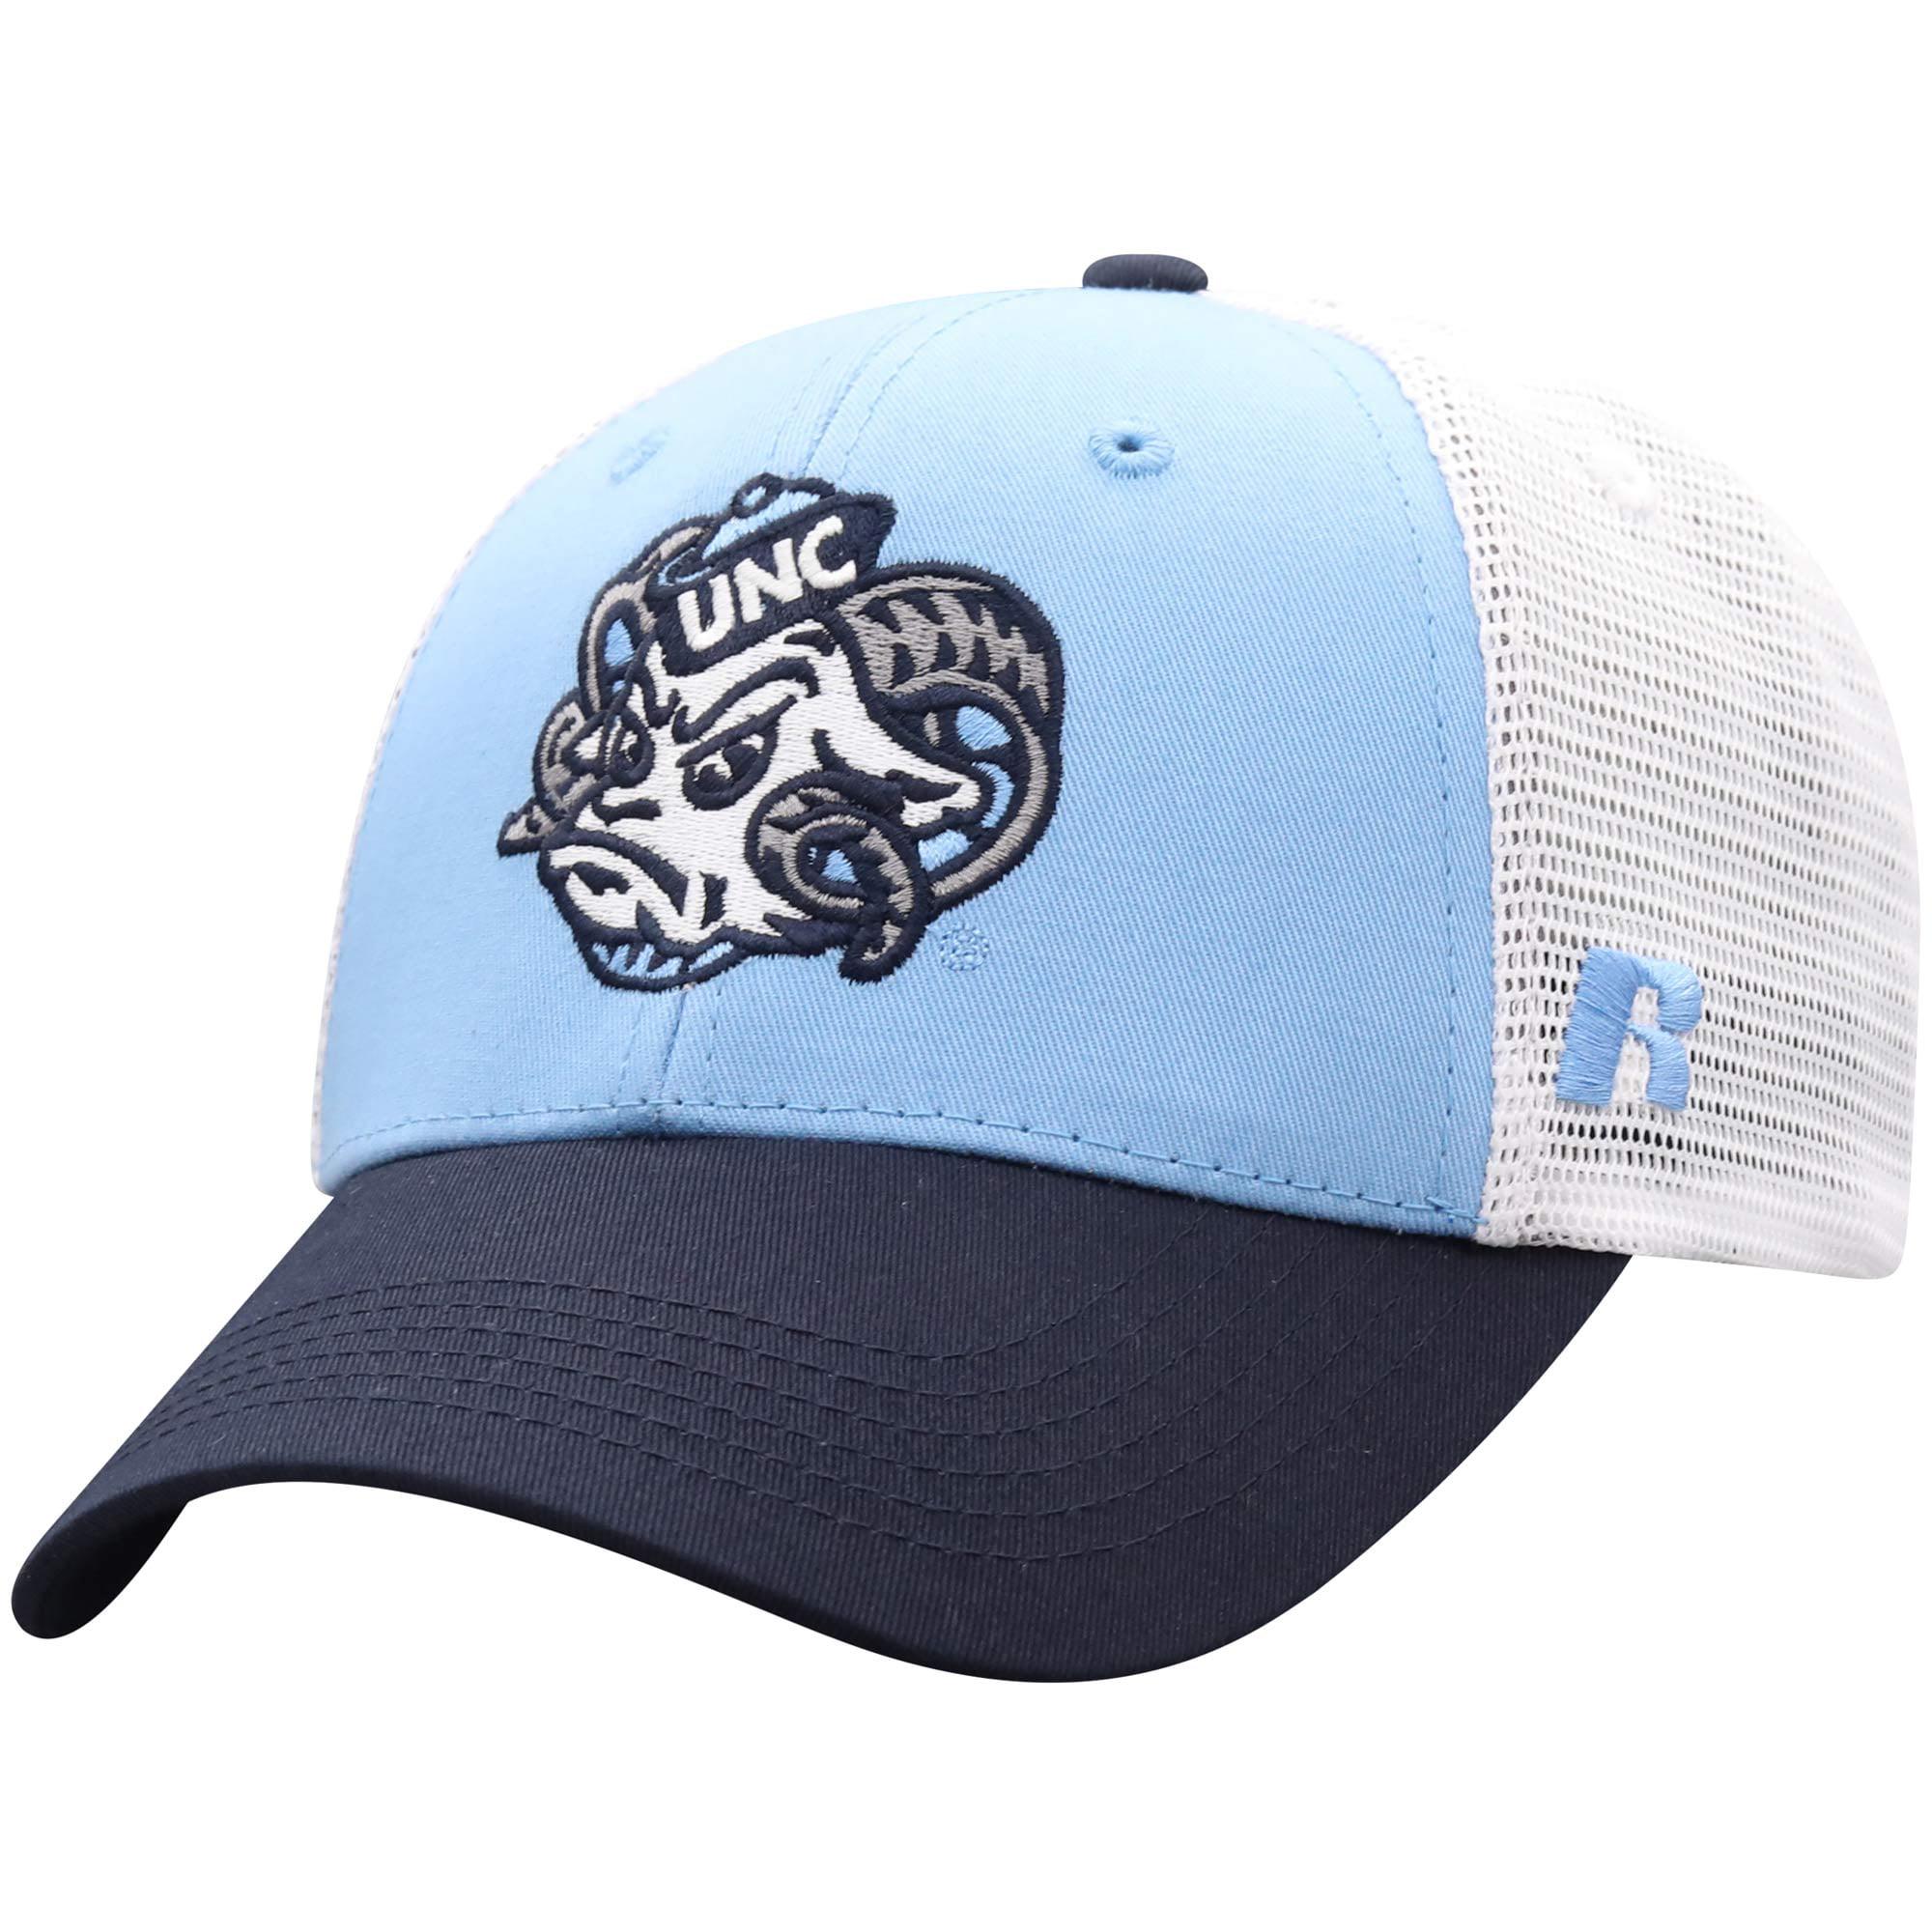 Men's Russell Carolina Blue/White North Carolina Tar Heels Steadfast Snapback Adjustable Hat - OSFA